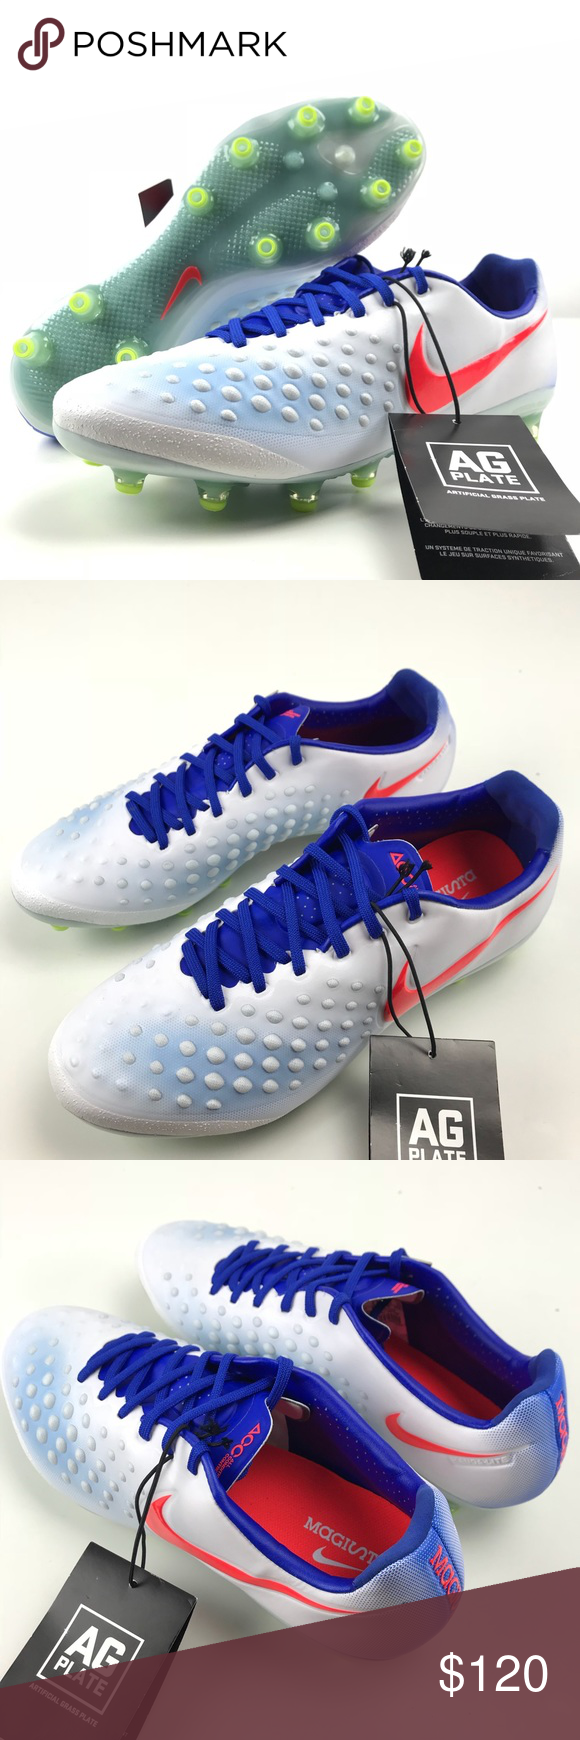 Nike Magista Opus II 2 AG Pro Soccer Cleats Nike Magista Opus II 2 AG  Women s 9 Soccer Cleats White Blue Crimson 844217 164 Brand new 031c725711b